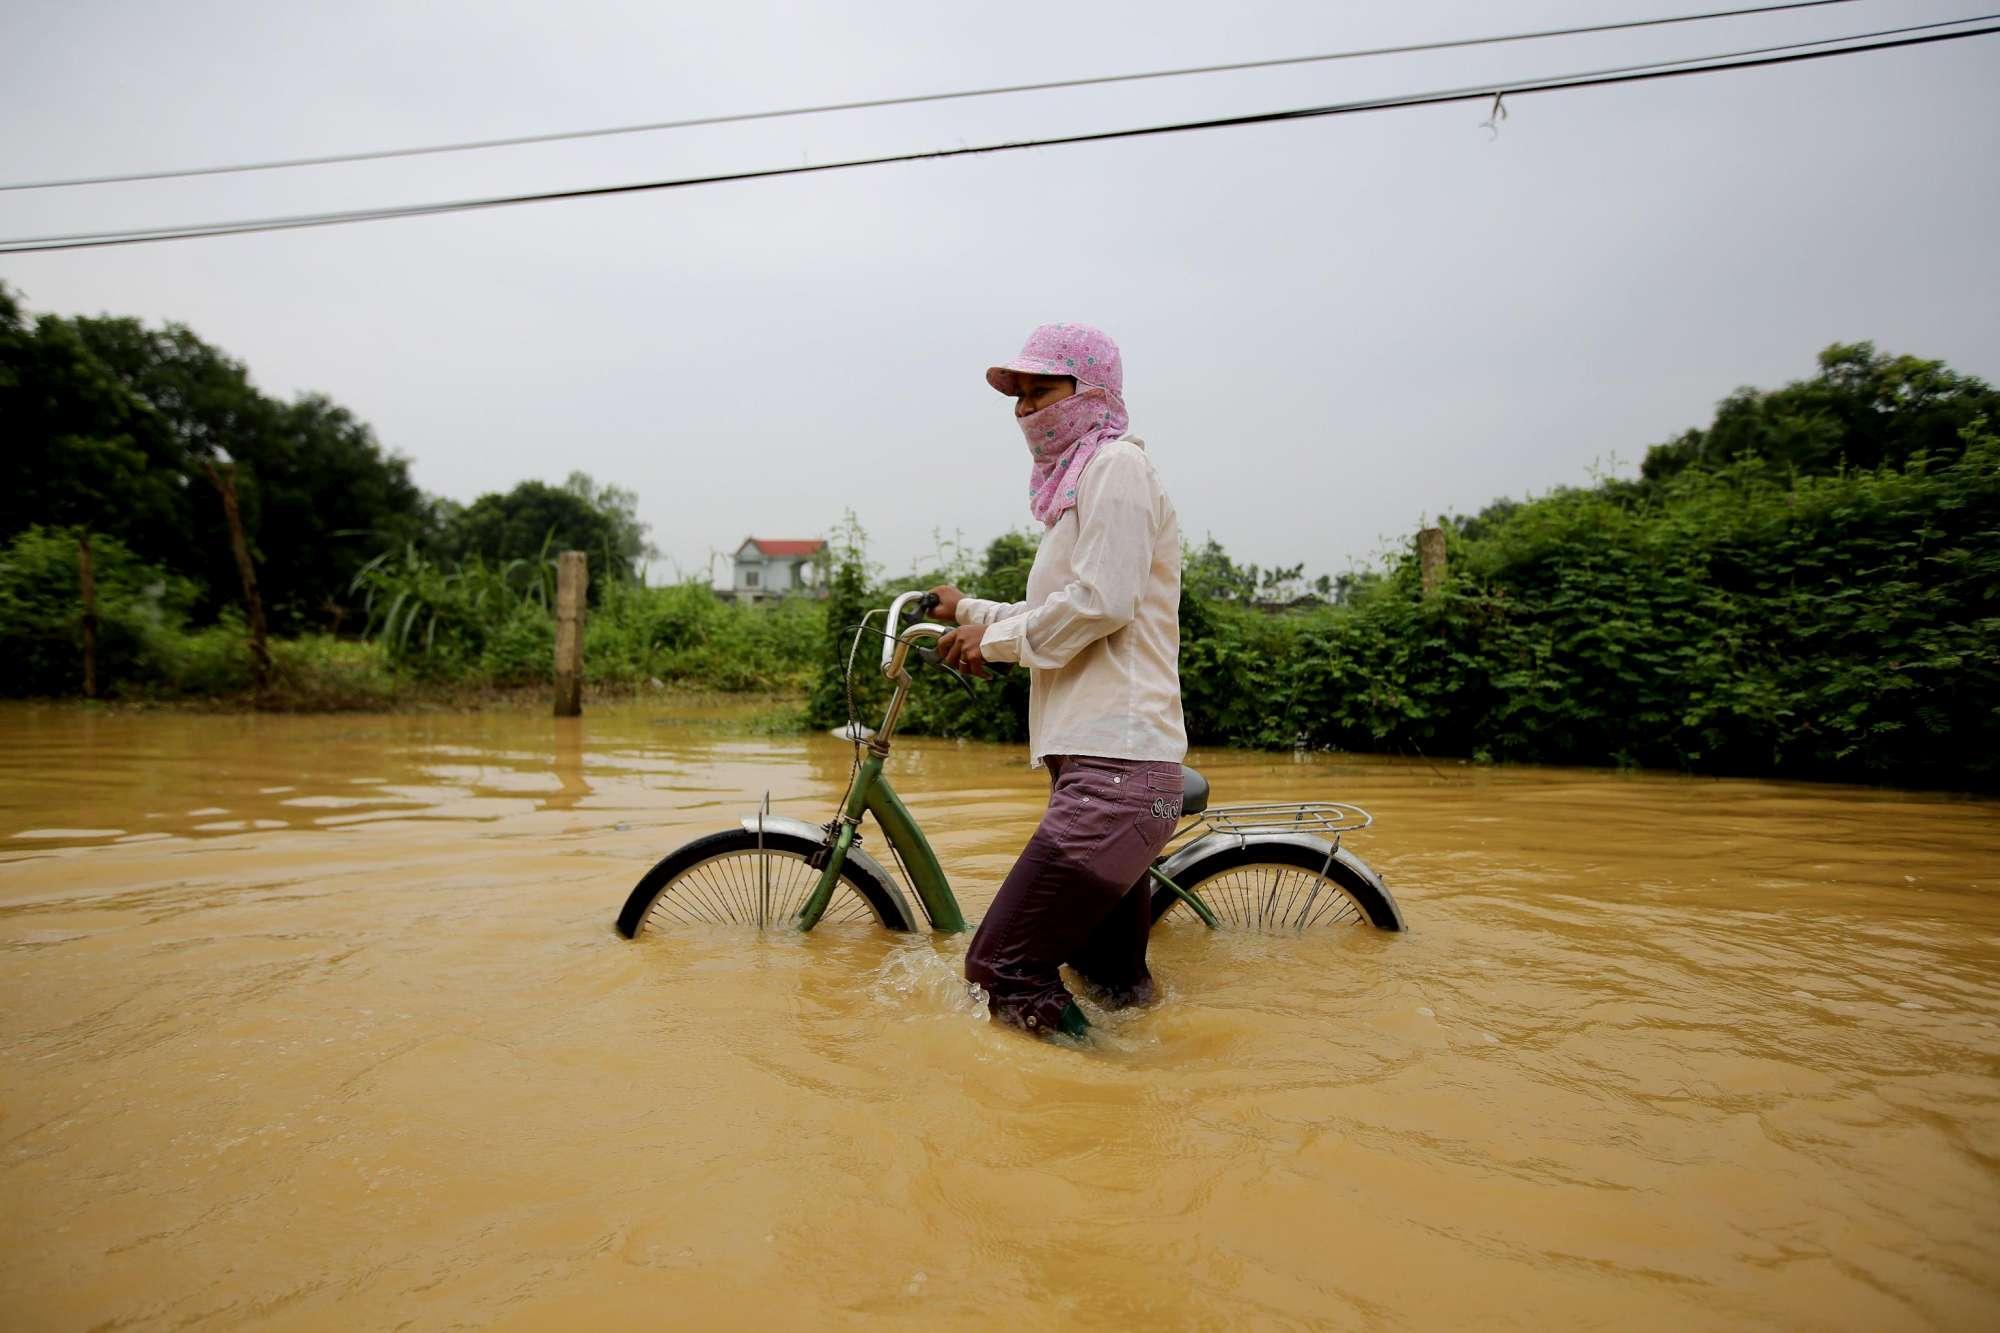 Piogge torrenziali devastano il Vietnam